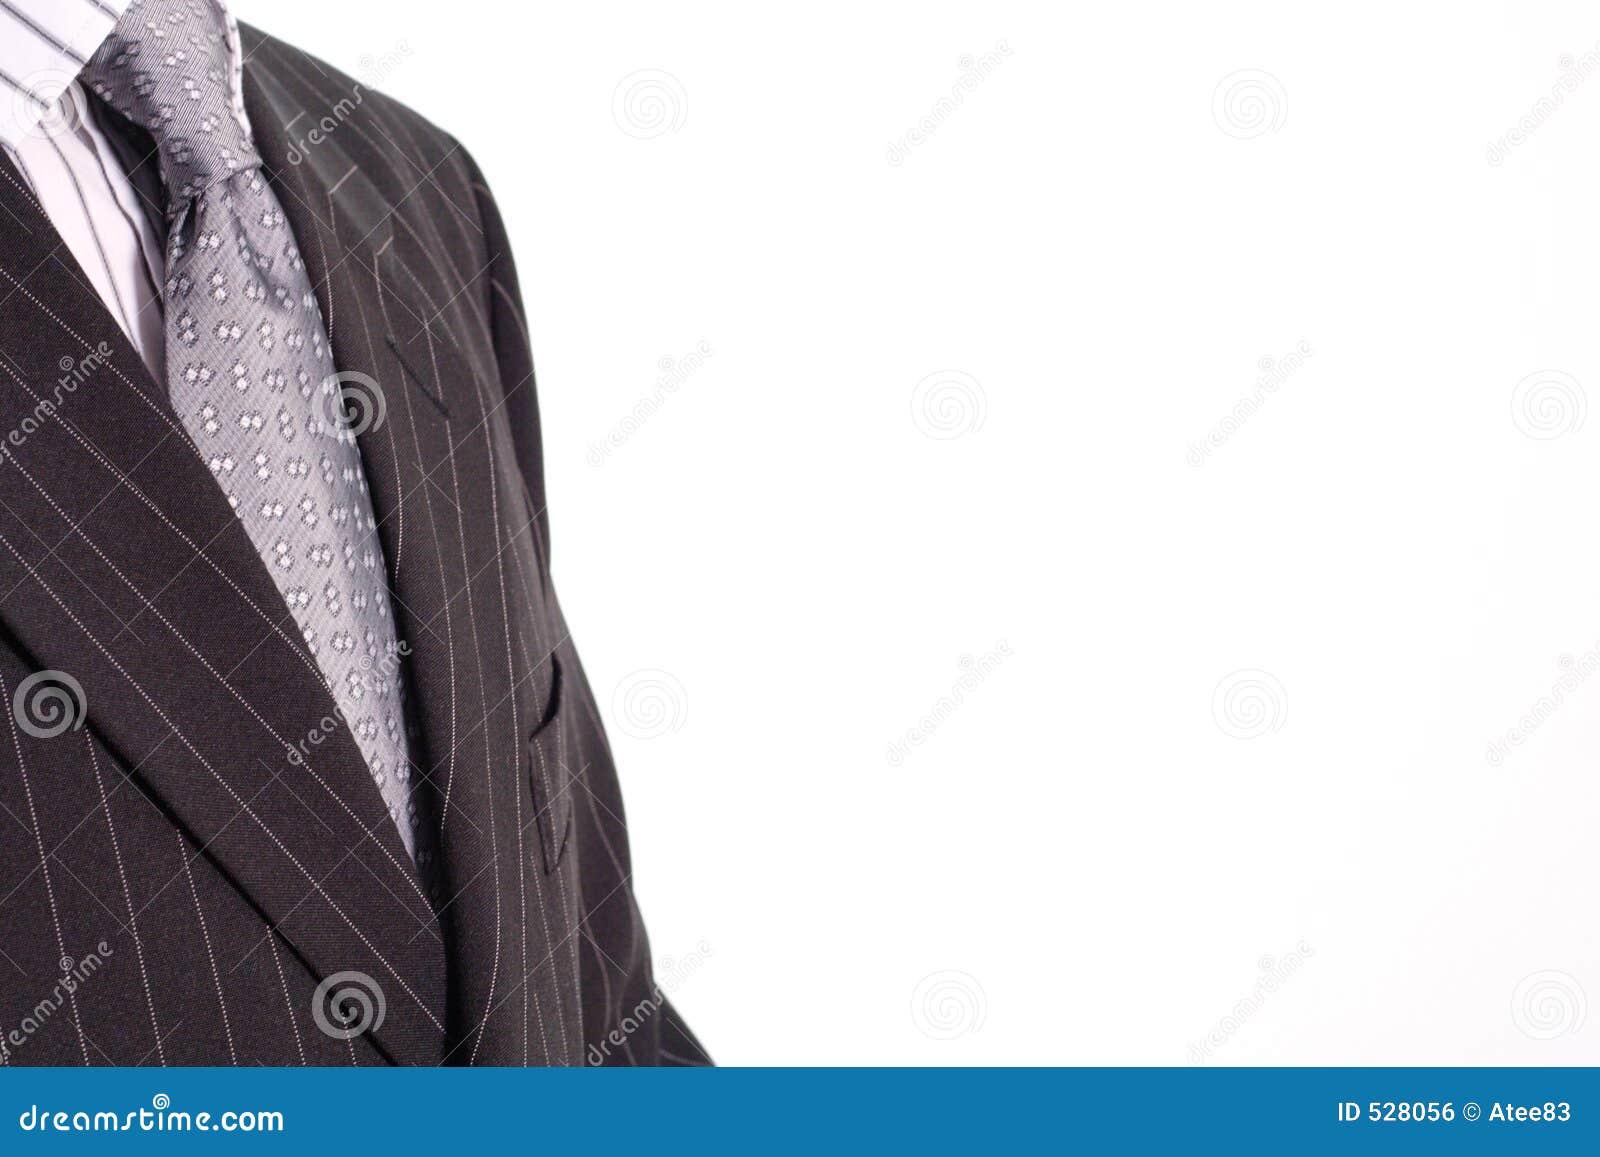 Download 黑人诉讼 库存照片. 图片 包括有 正式, 班卓琵琶, 机会, 执行委员, 律师, 数据, 员工, 暂挂, 私有 - 528056